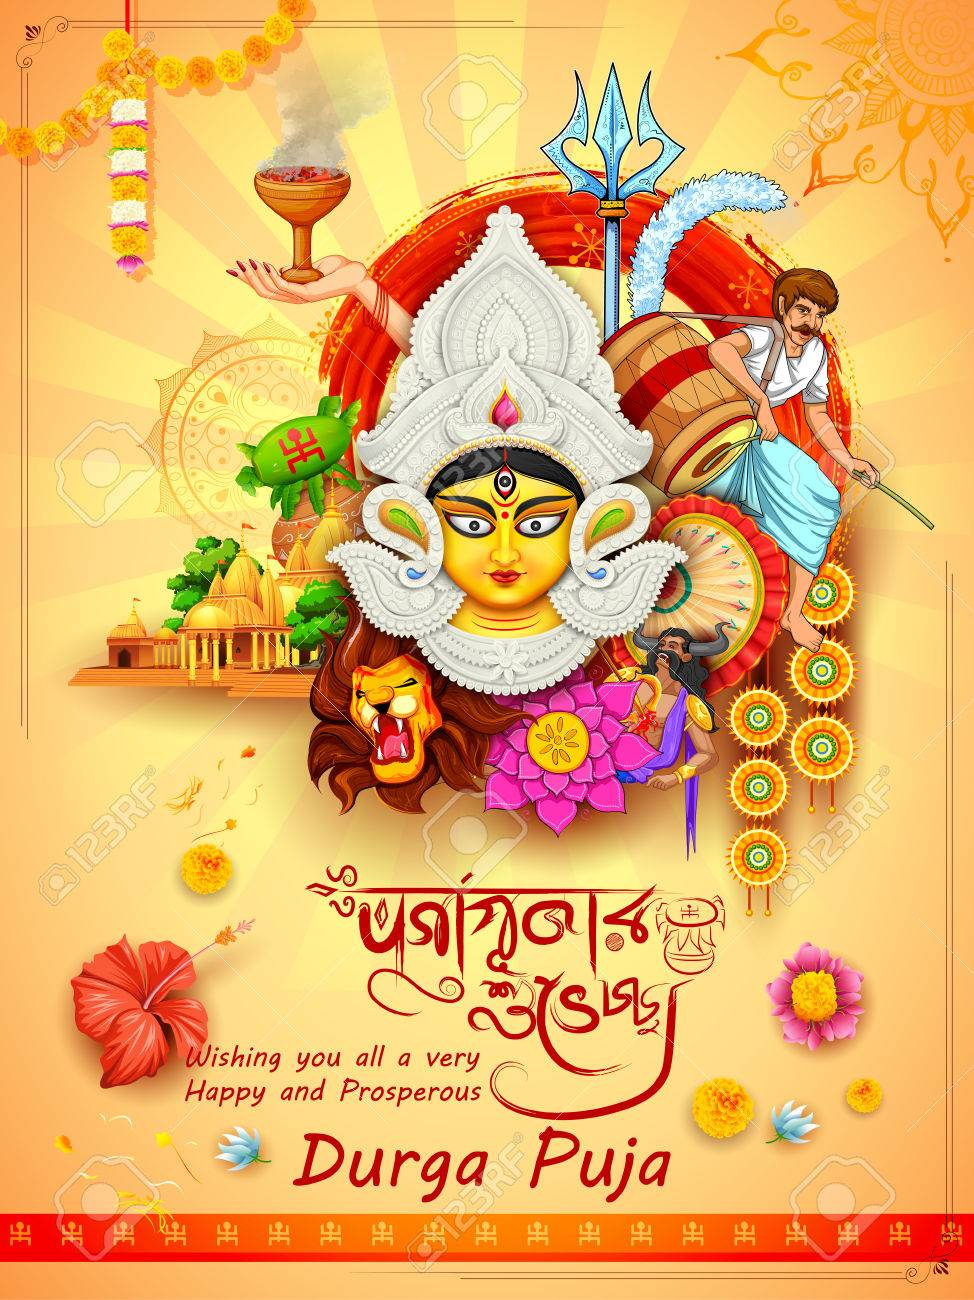 Illustration of goddess durga in happy dussehra background with illustration of goddess durga in happy dussehra background with bengali text durgapujor shubhechha meaning happy durga m4hsunfo